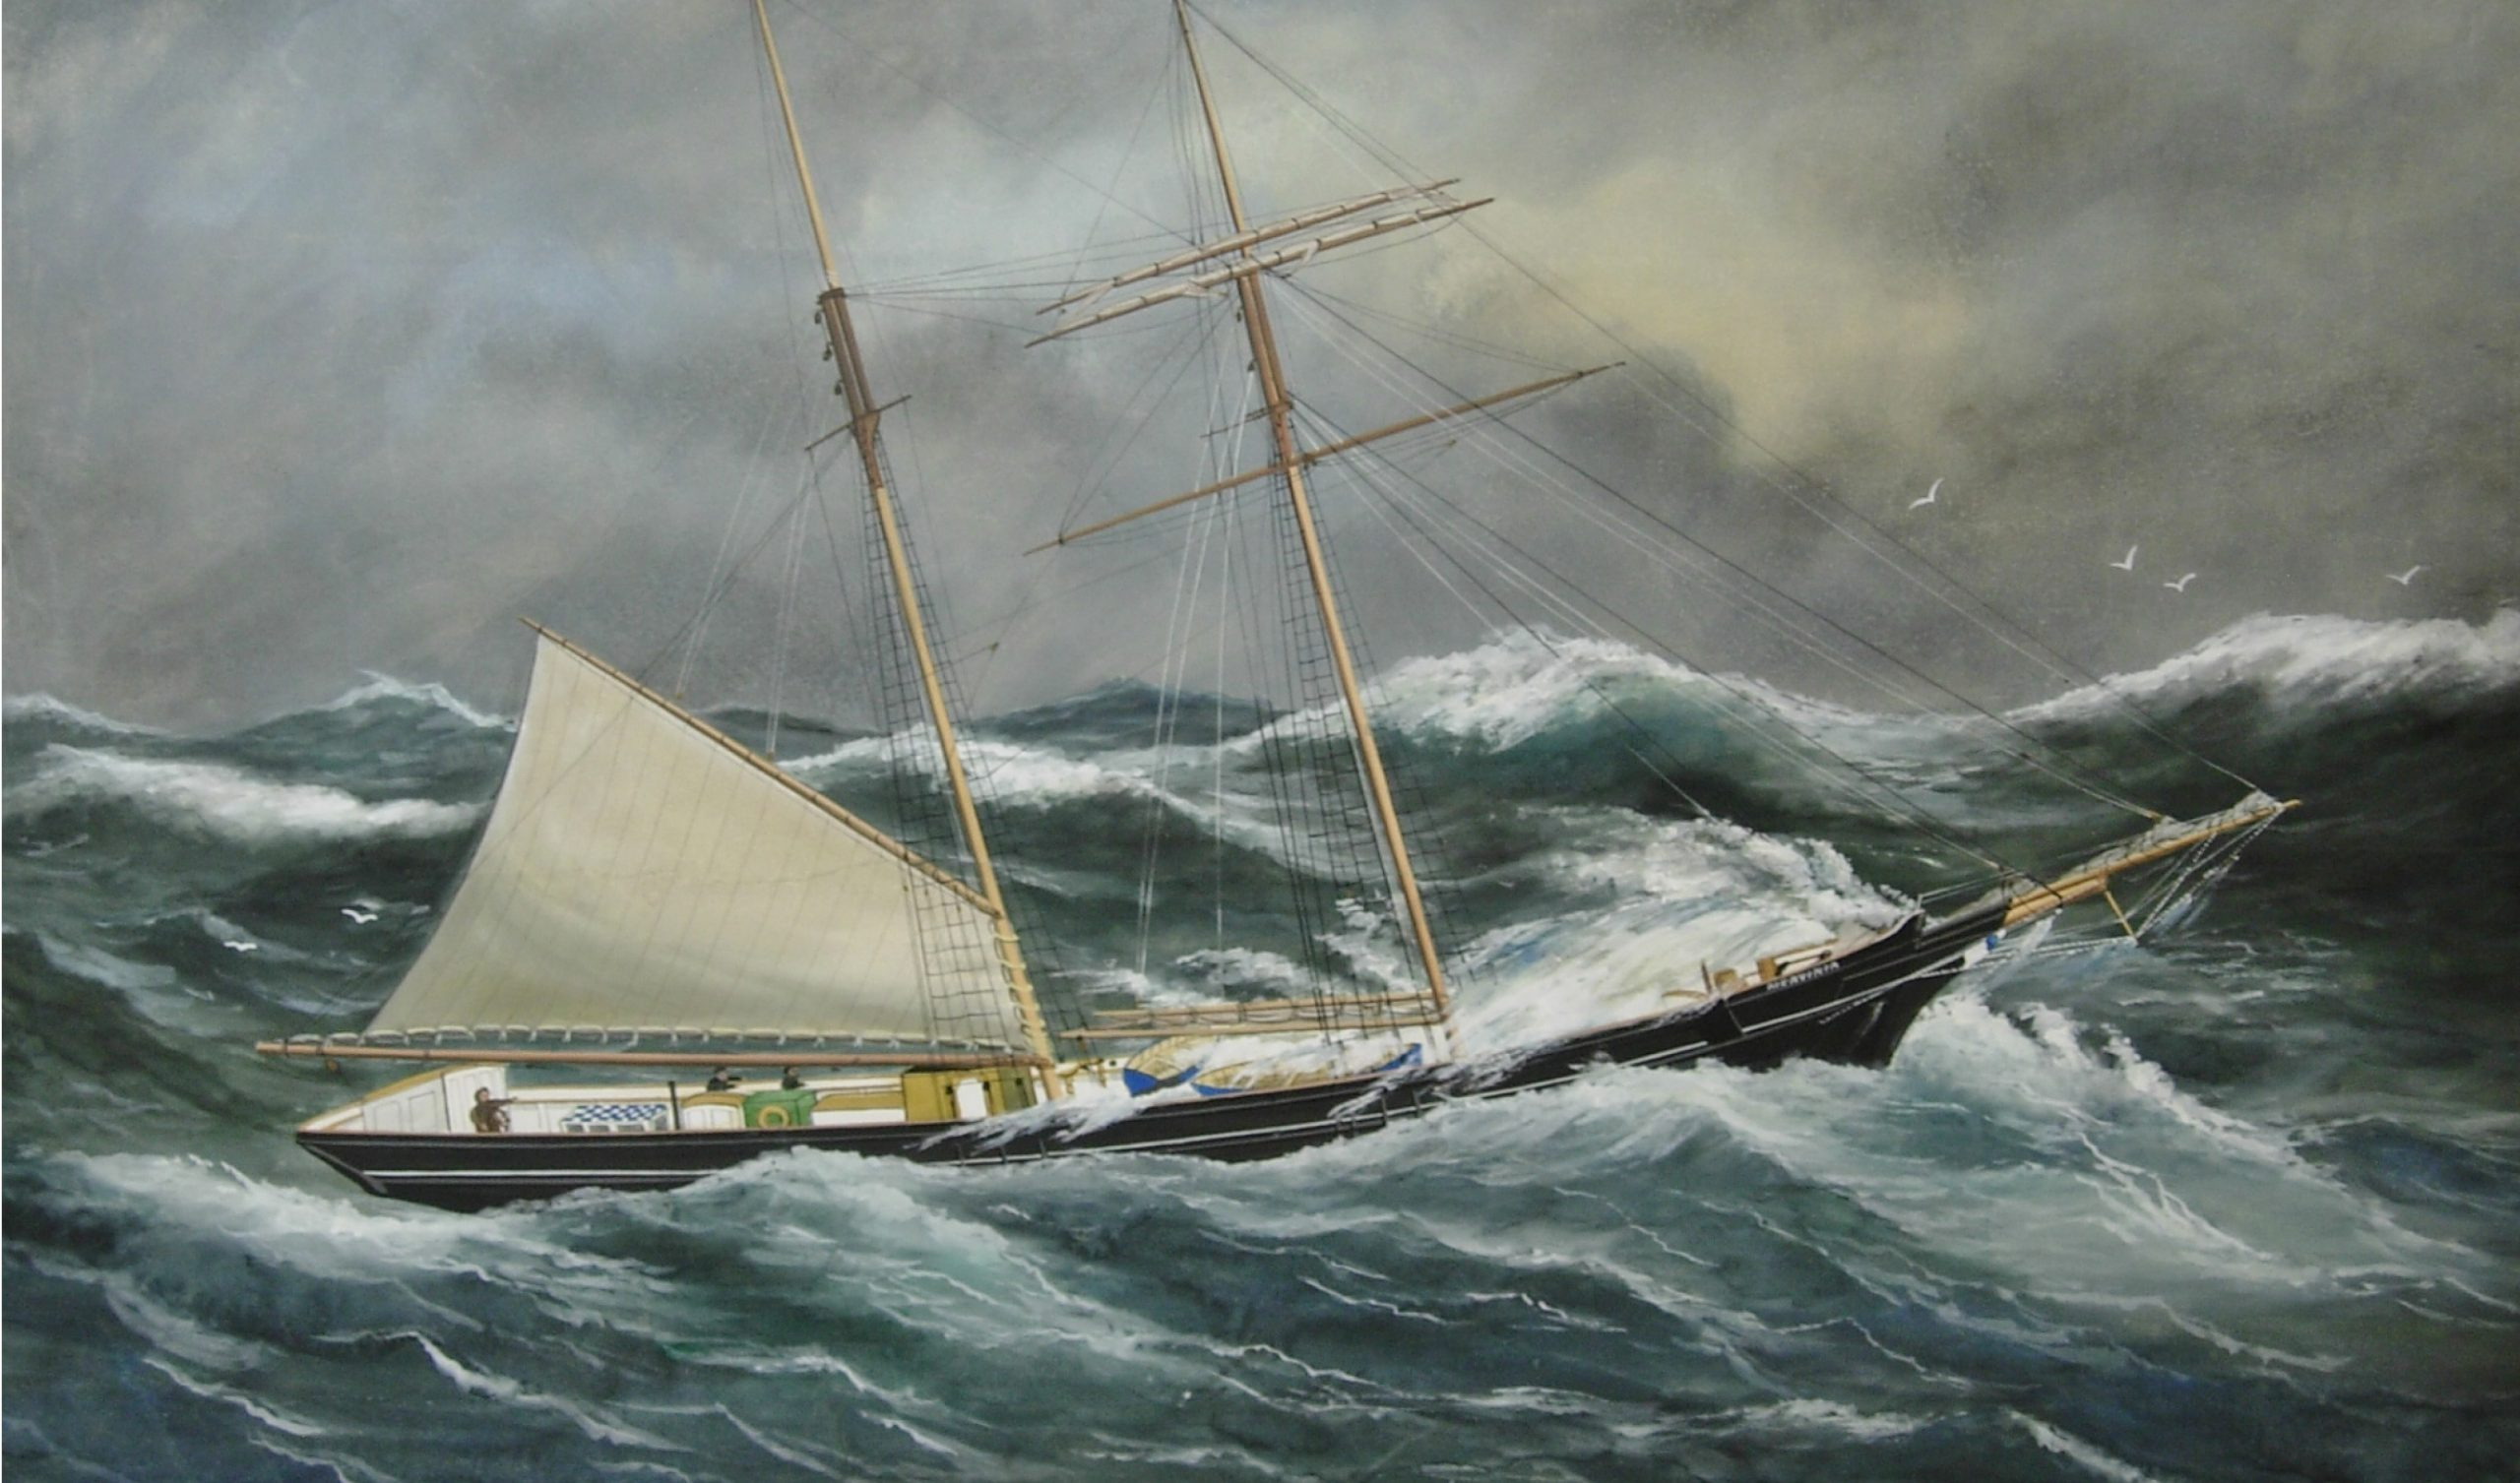 Reuben Chappell - after conservation